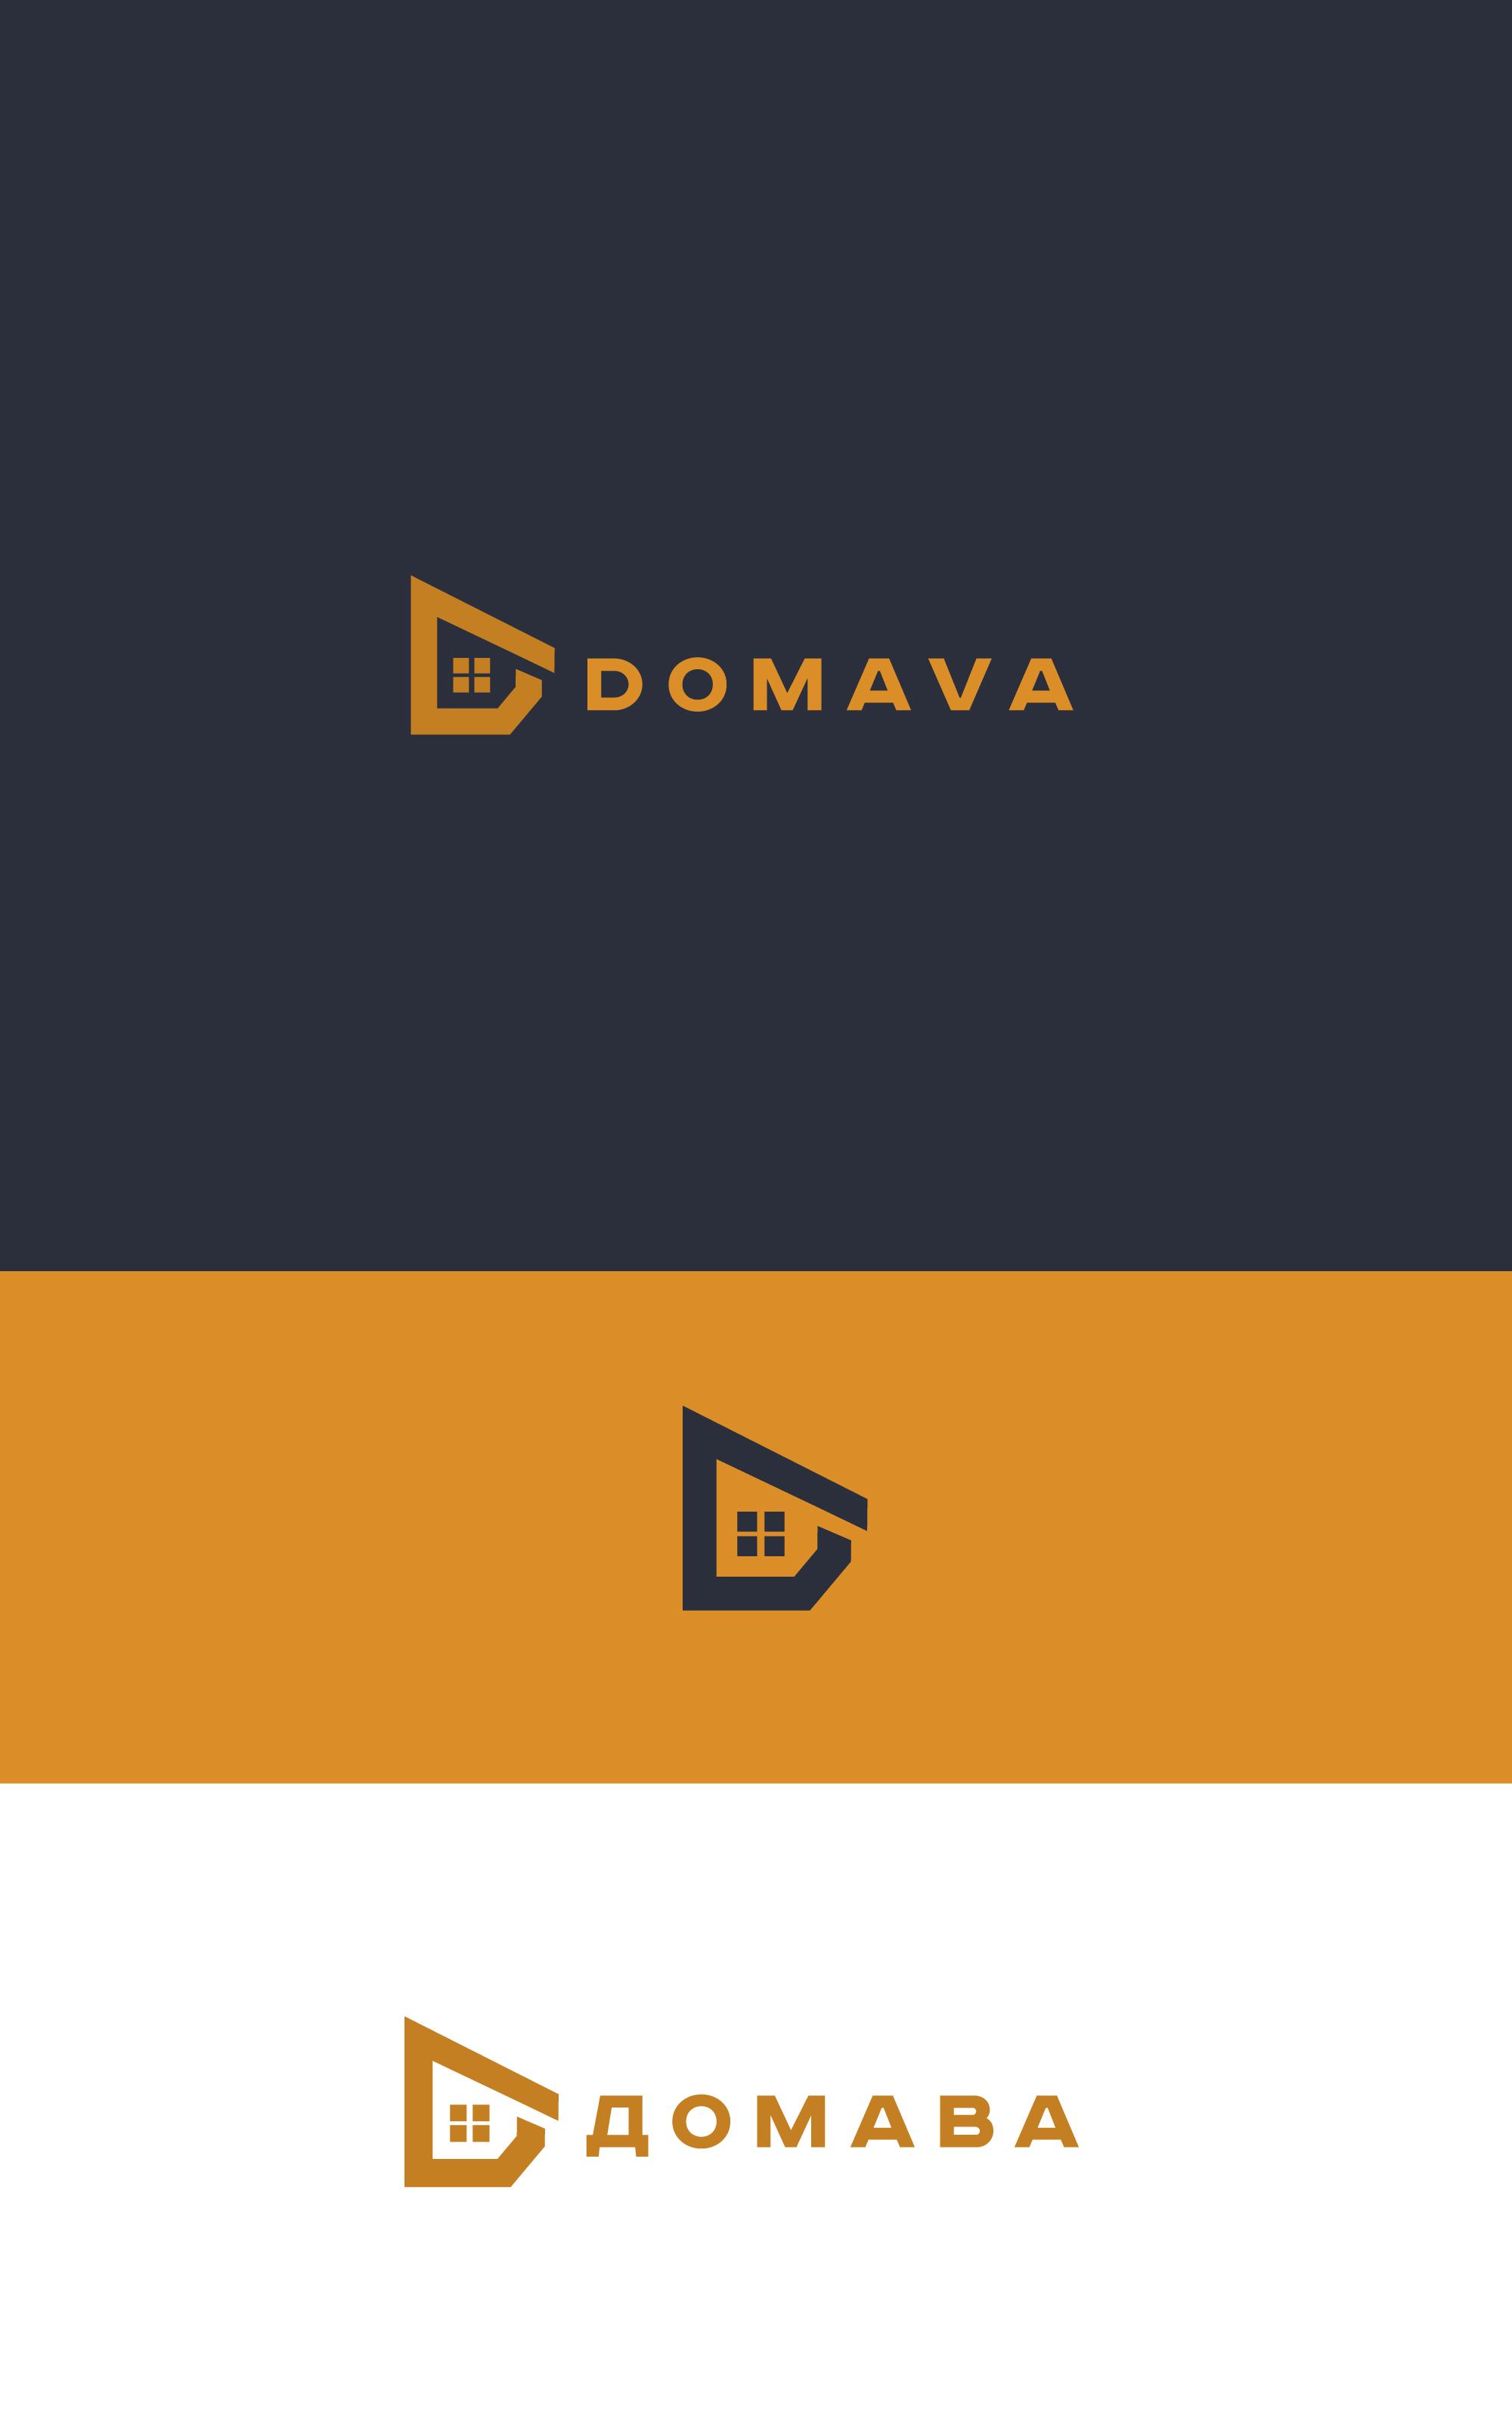 Разработка логотипа с паспортом стандартов фото f_6045ba27413d1741.jpg